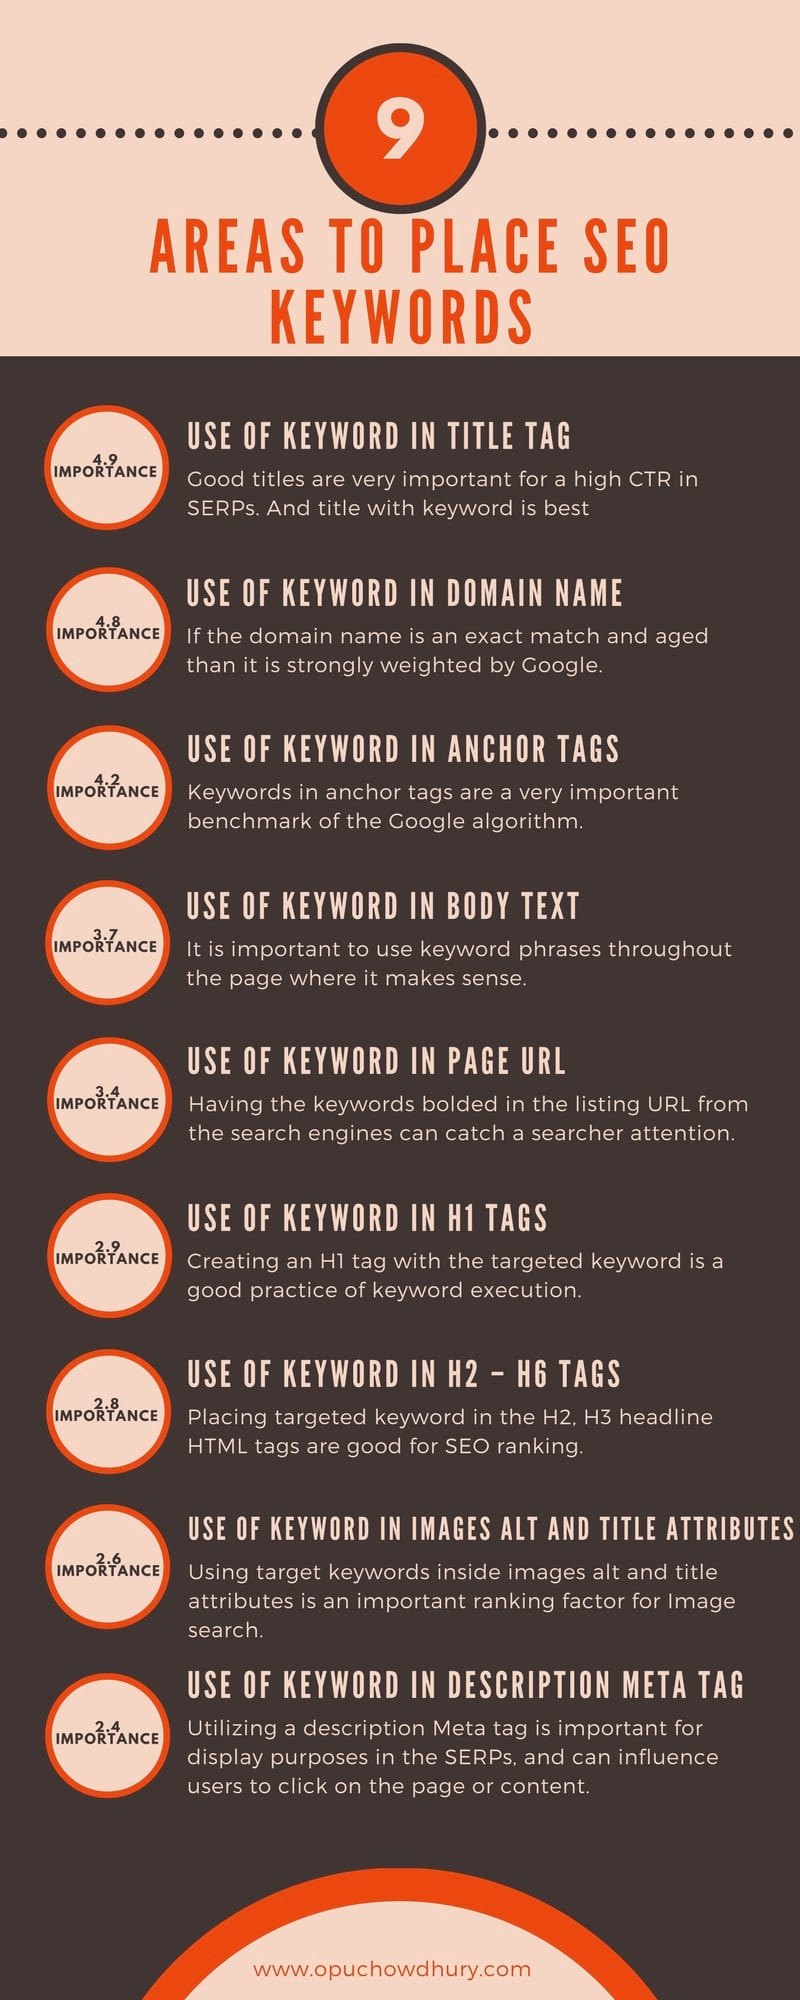 SEO Keywords Execution